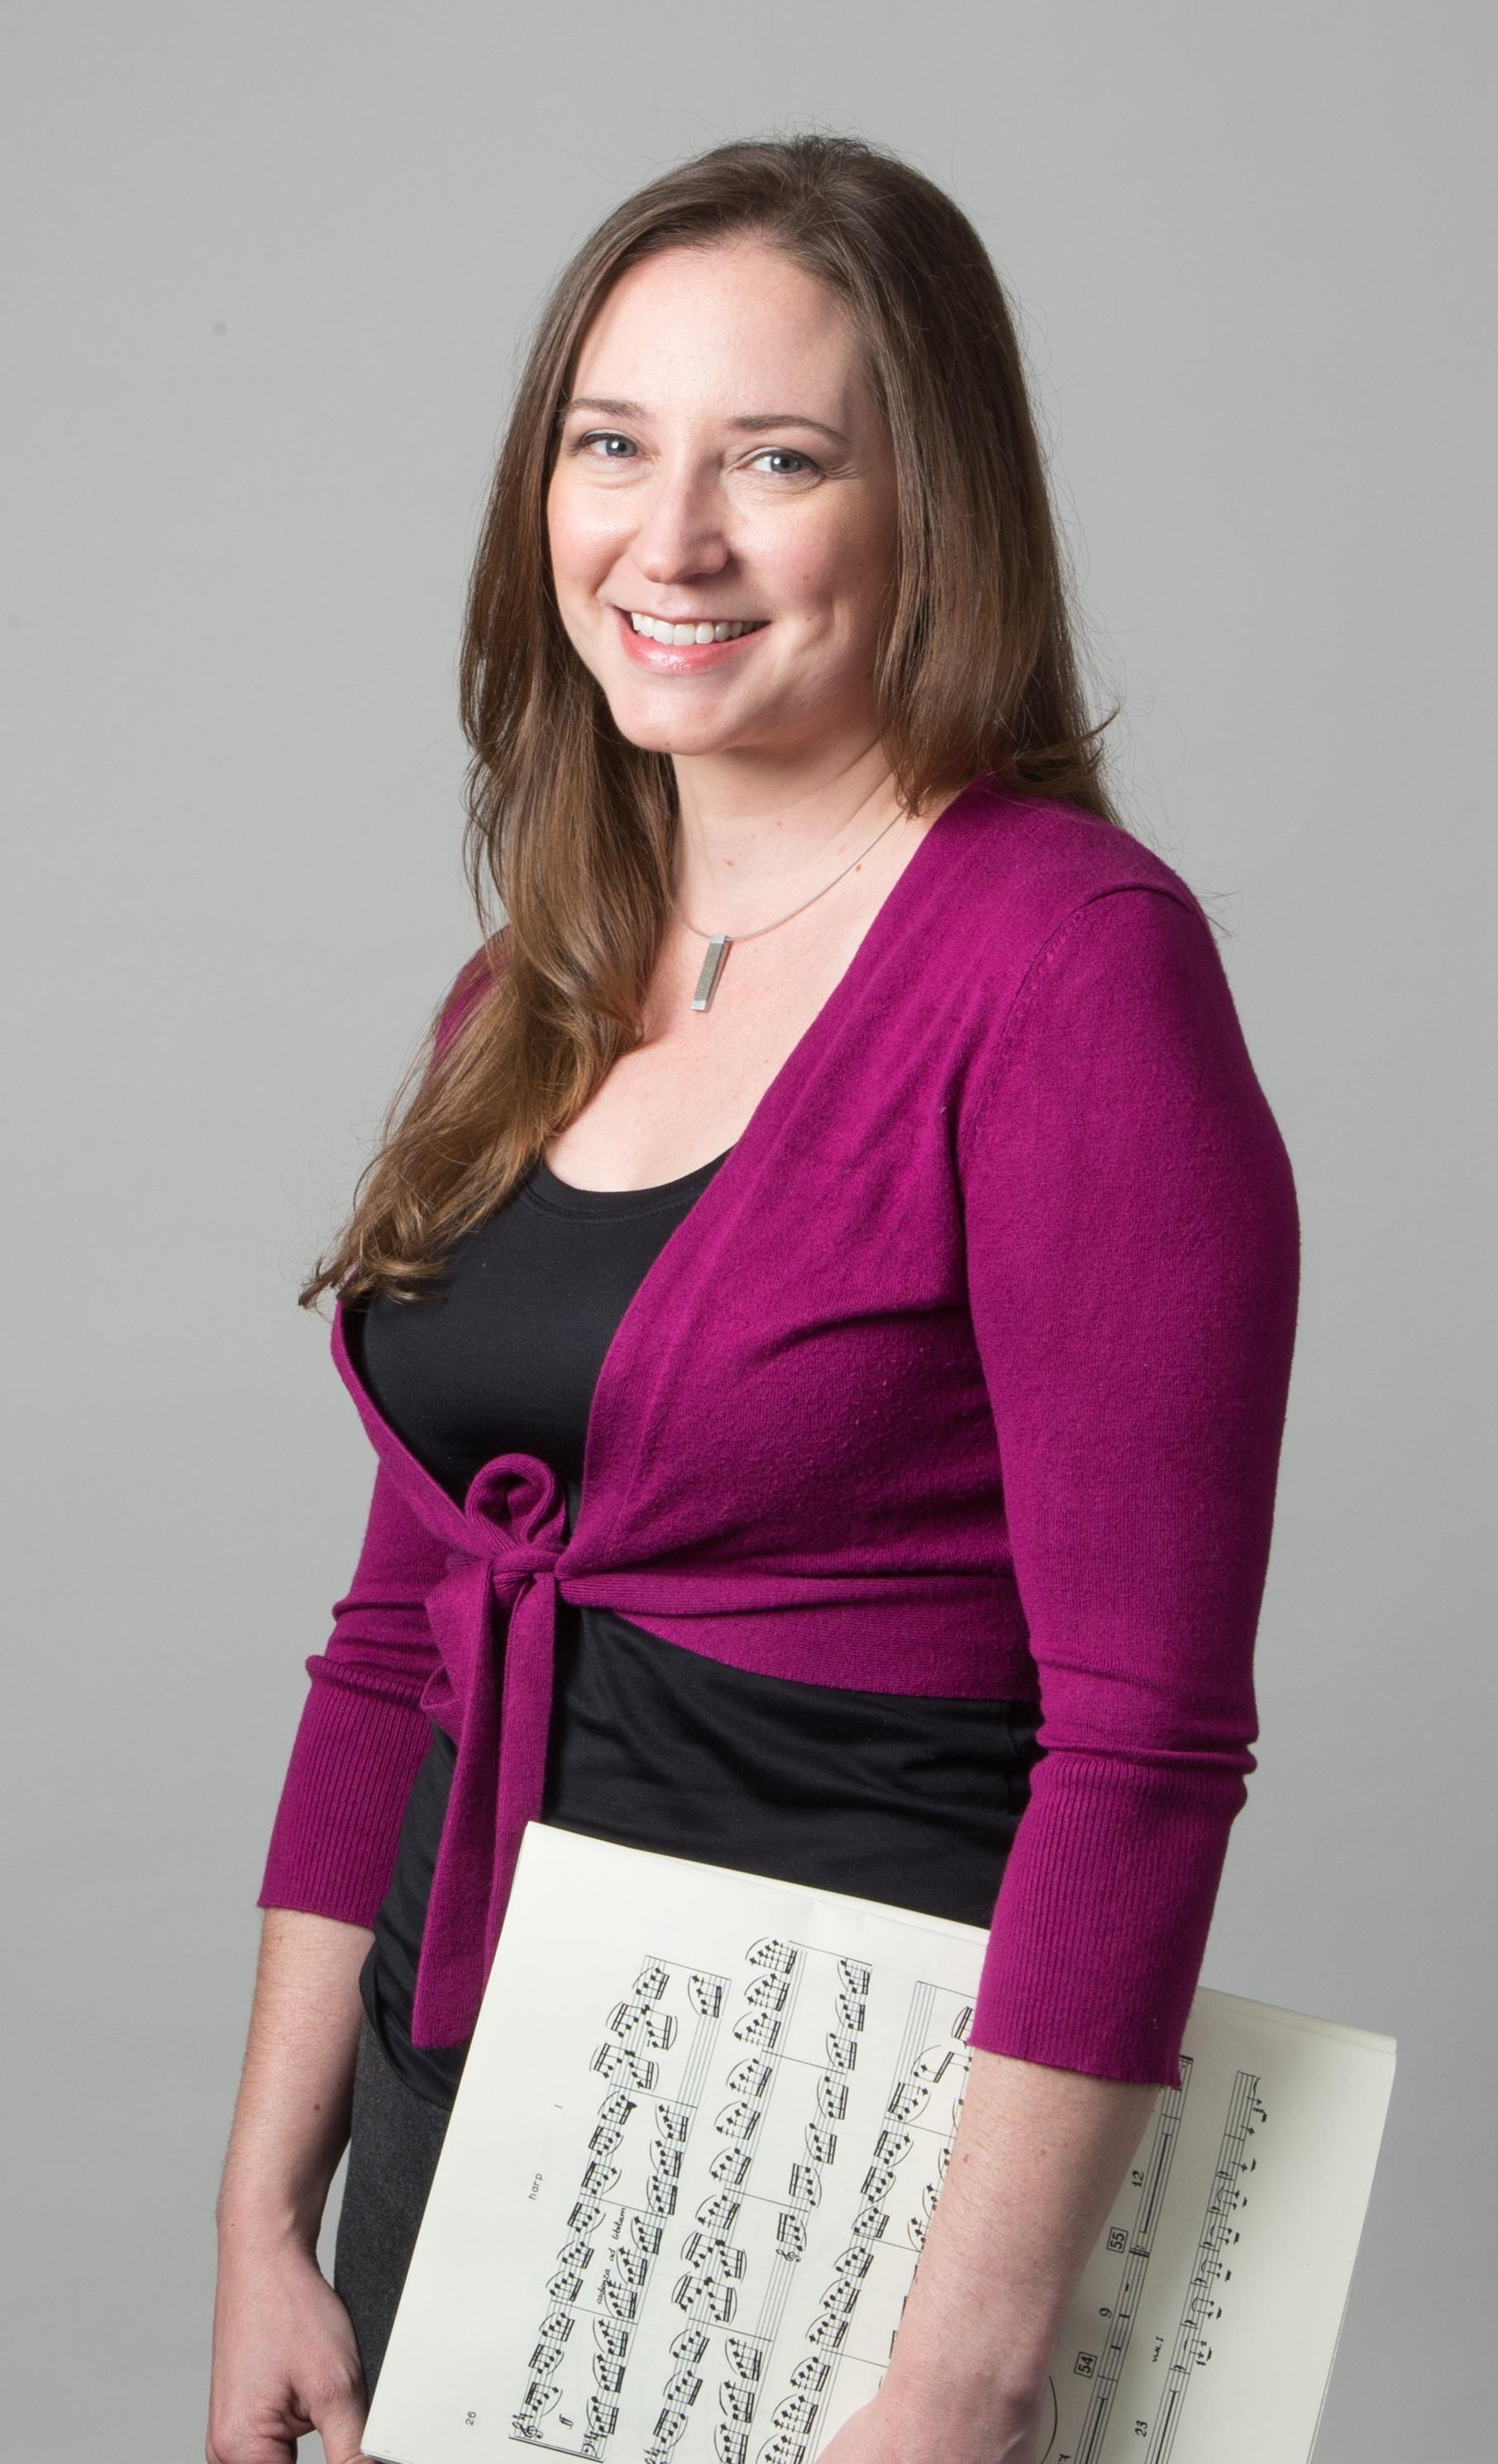 Dana Stiernberg Promoted to Associate